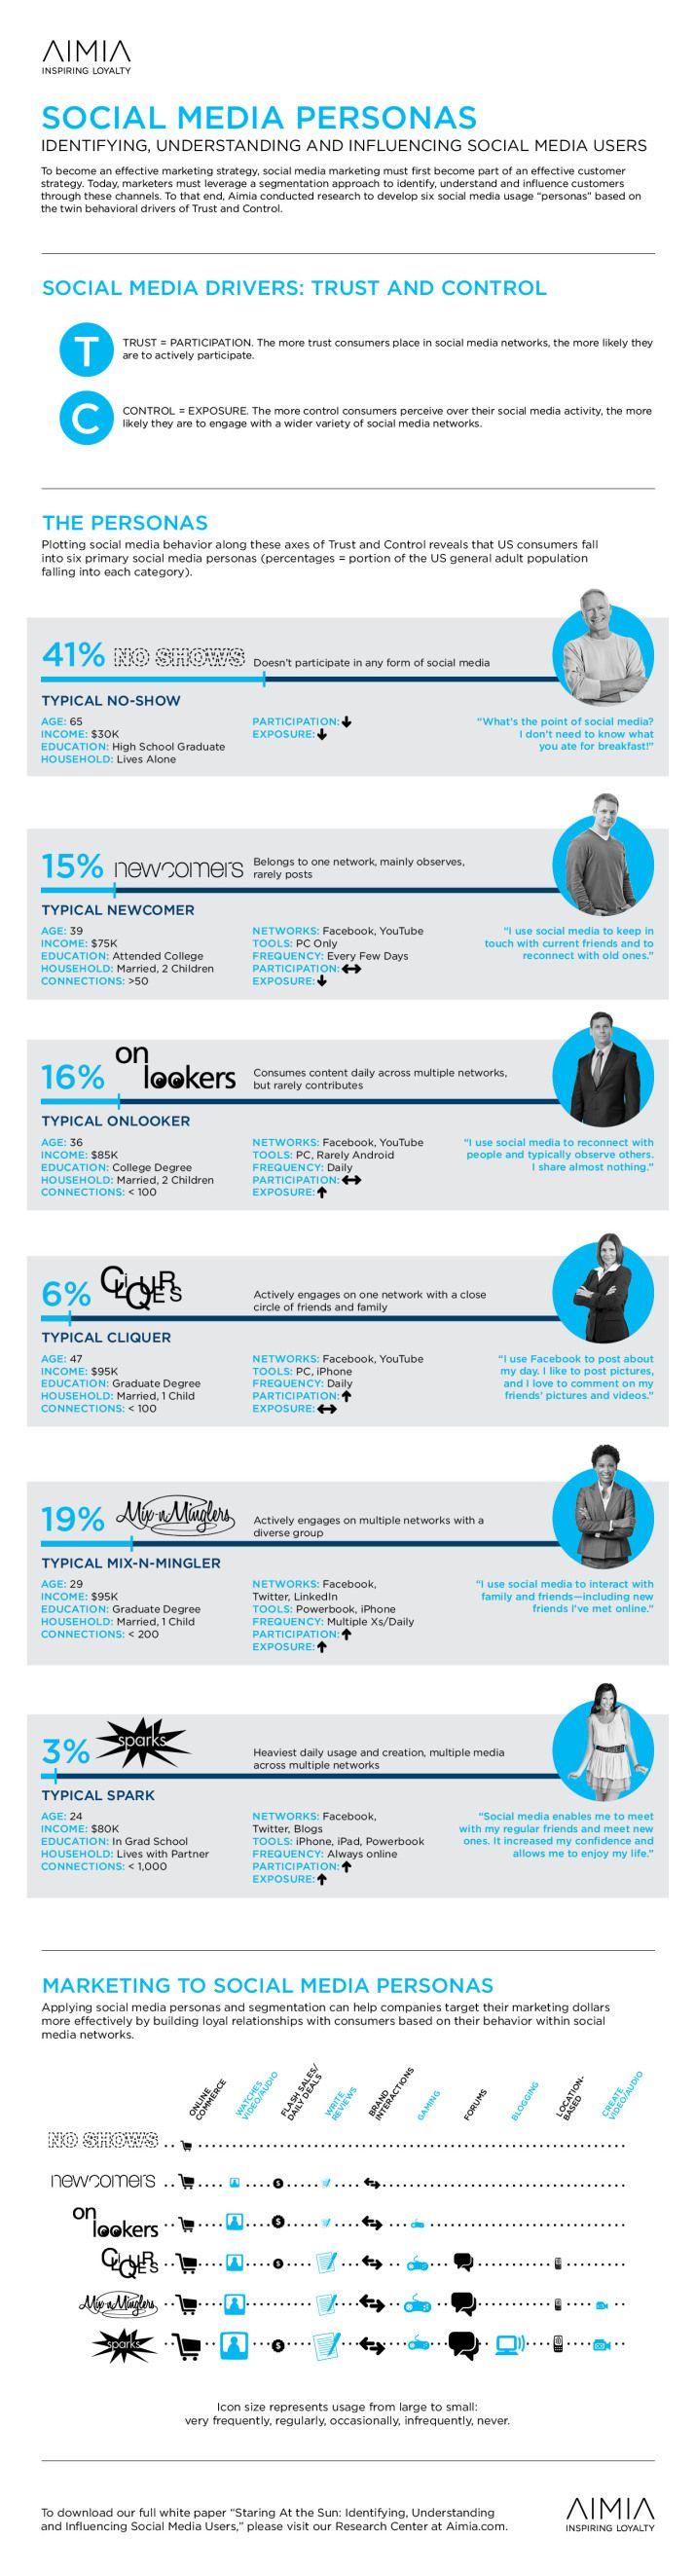 #SocialMedia #Personas Identifying, Understanding and Influencing #SocialMedia Users